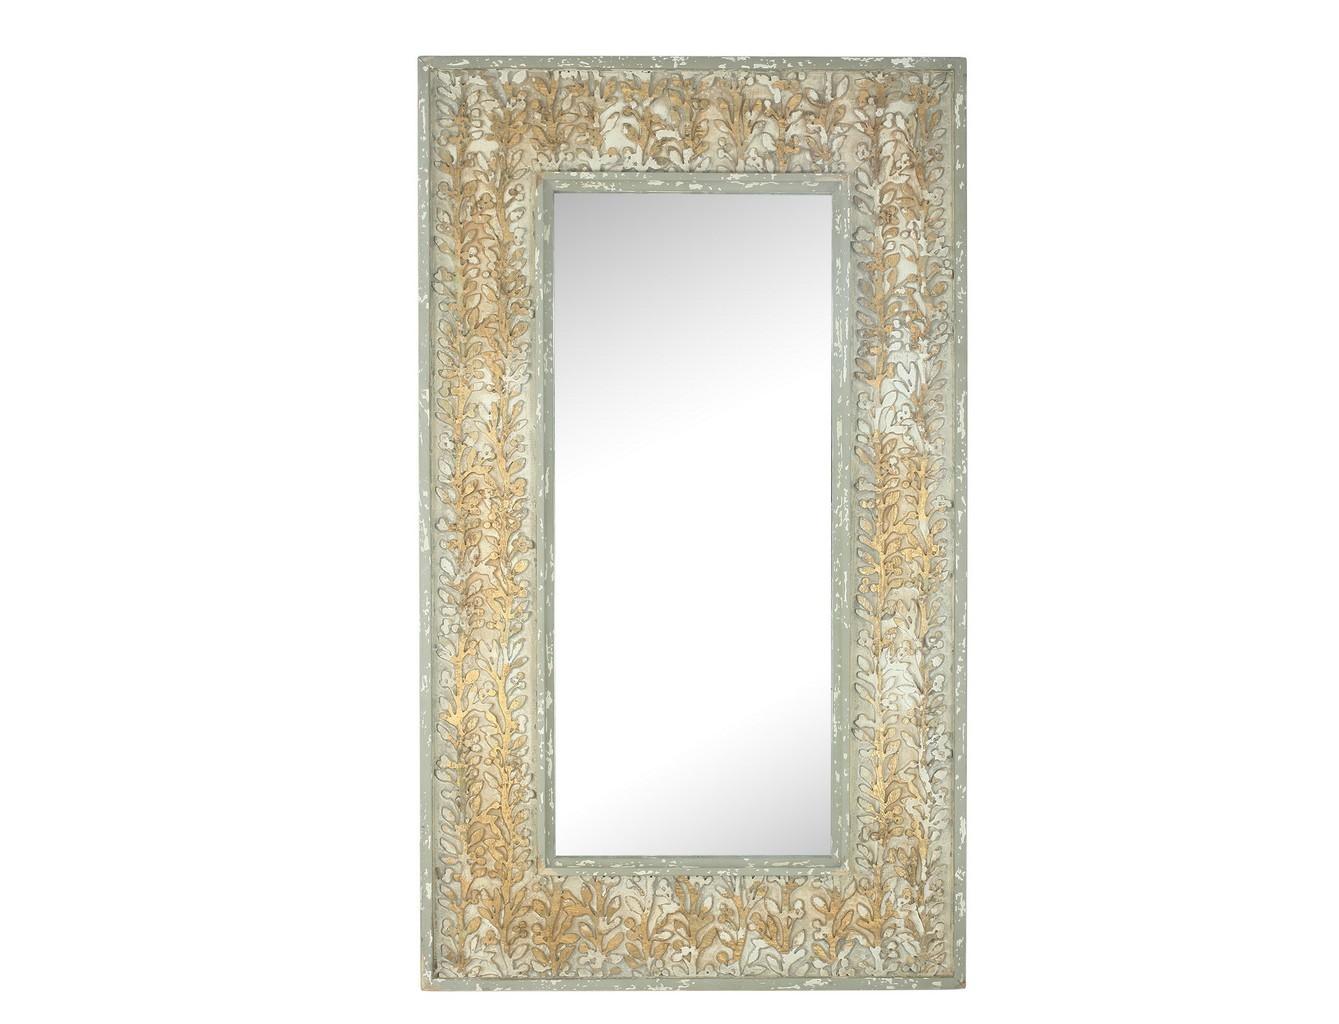 ЗеркалоНастенные зеркала<br><br><br>Material: МДФ<br>Ширина см: 84<br>Высота см: 144<br>Глубина см: 6